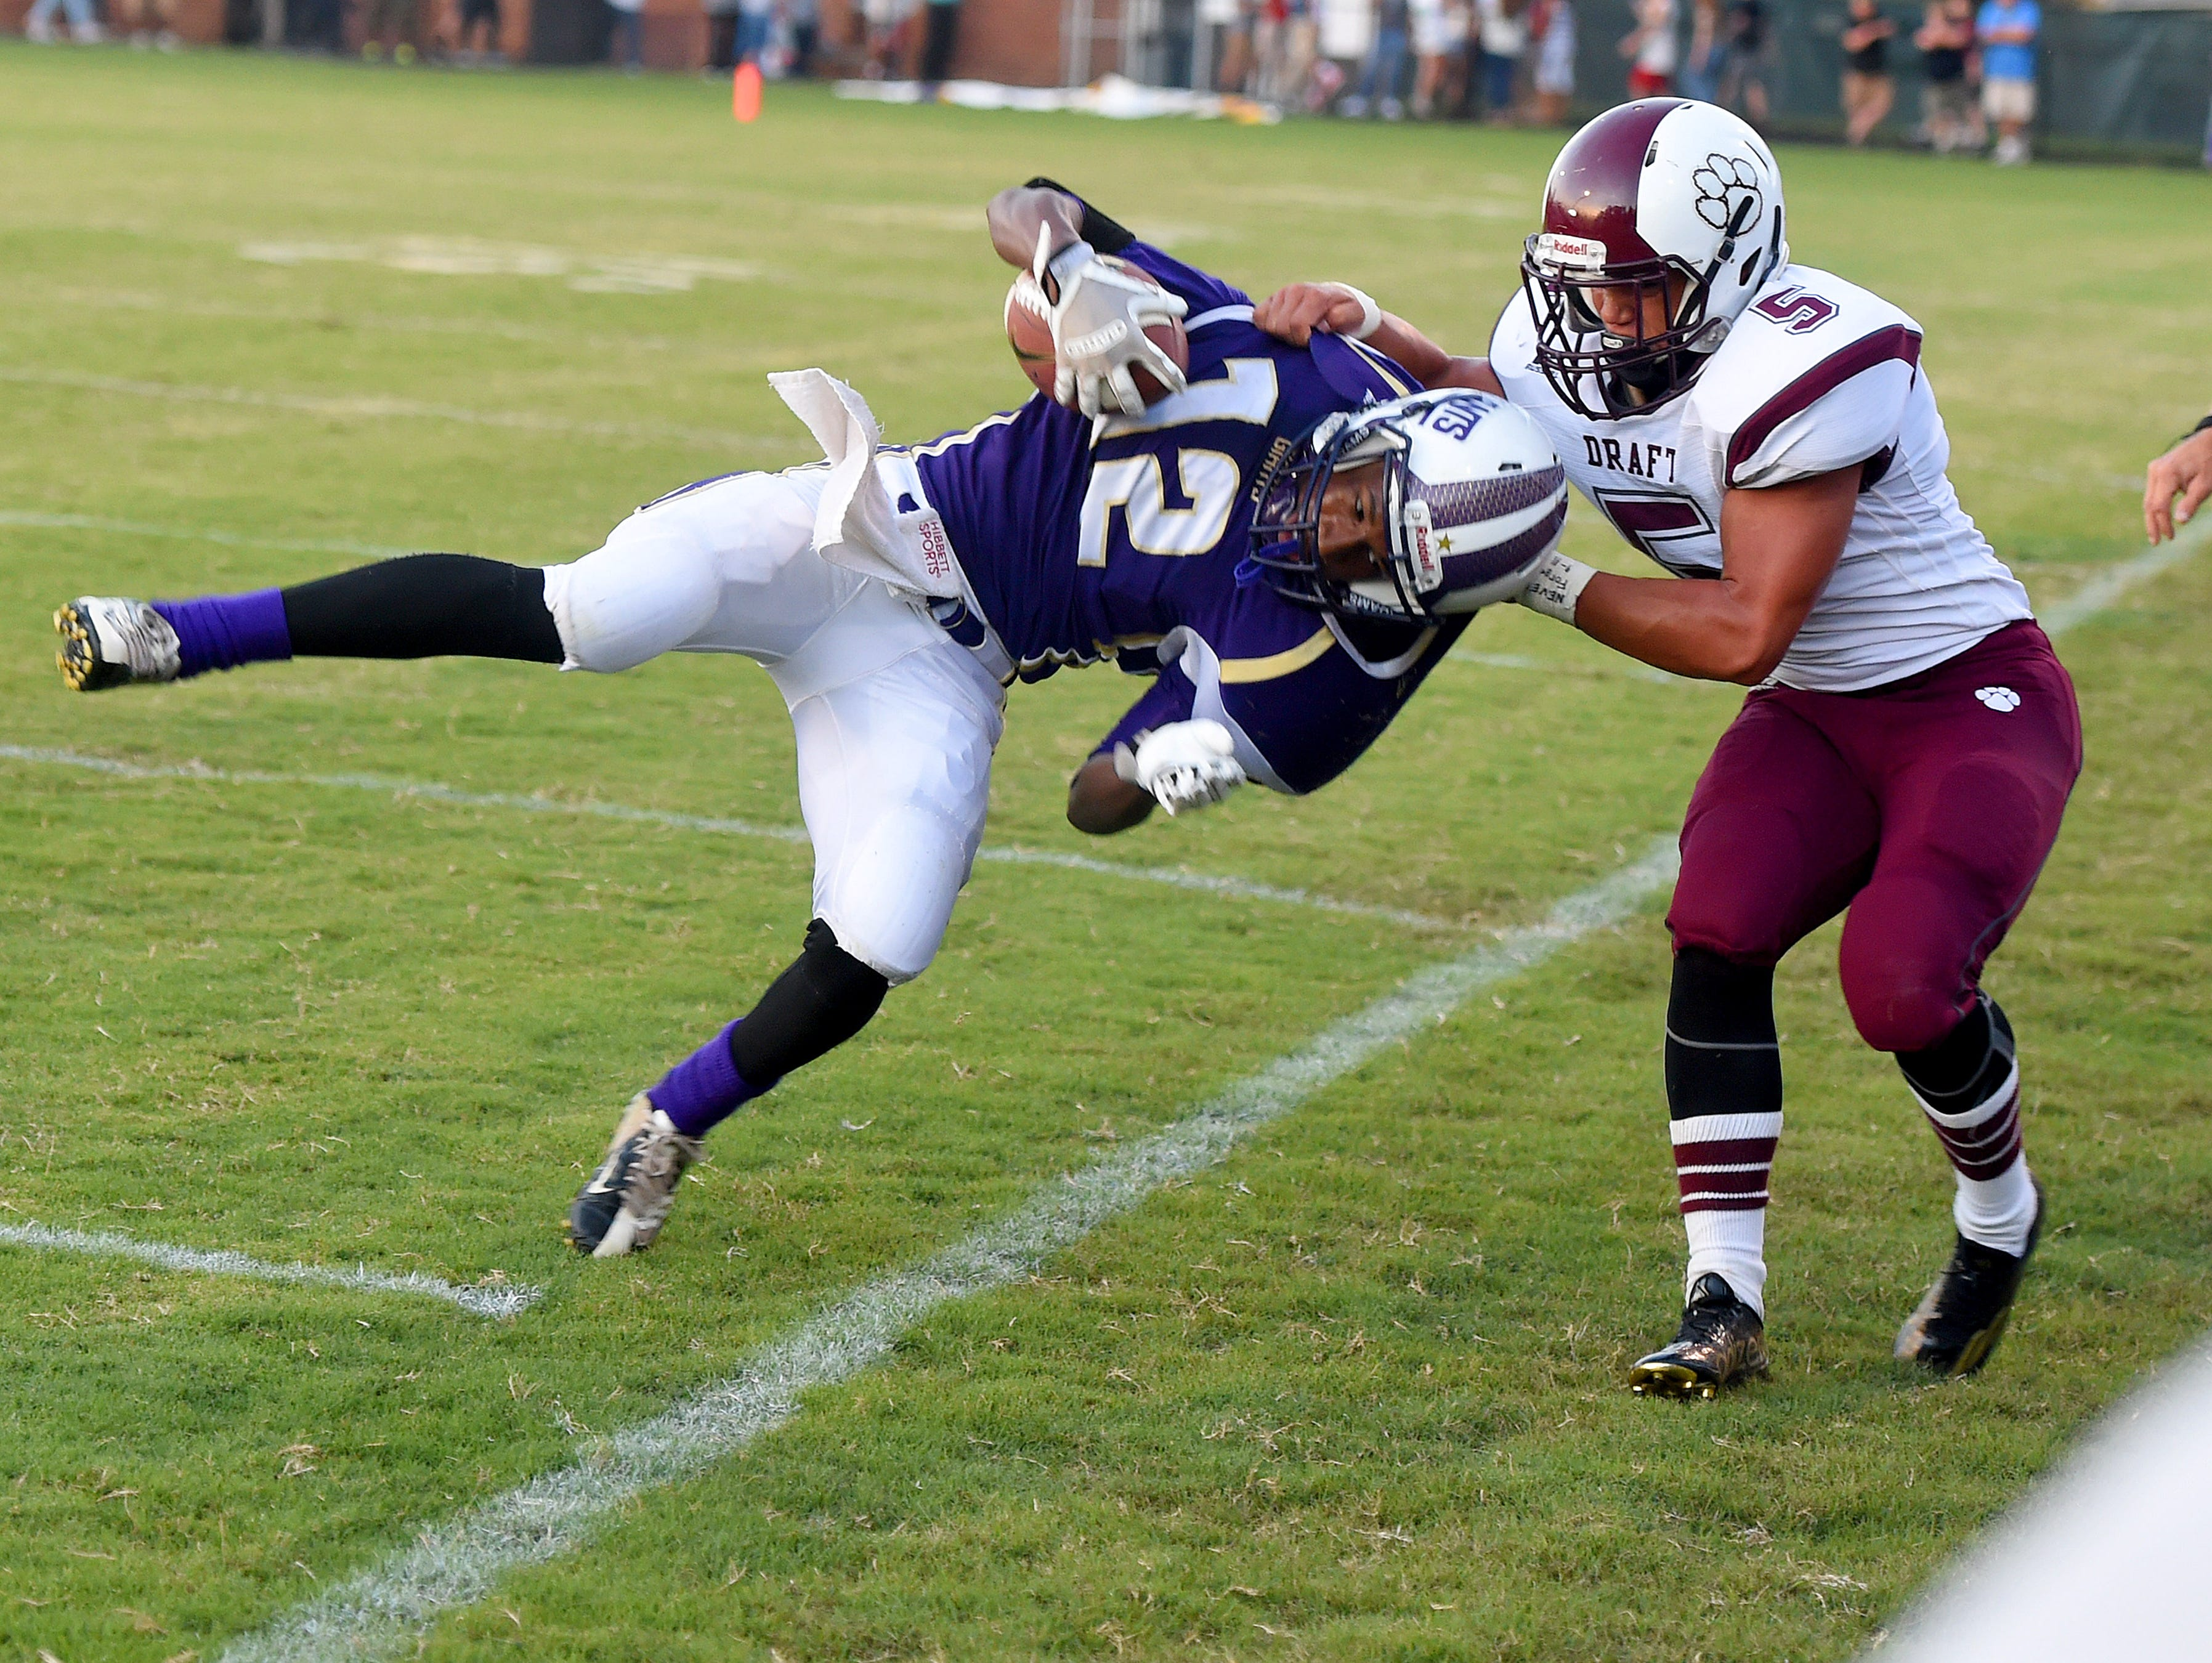 Waynesboro's Jequintus Chambers holds onto the ball as Stuarts Draft's Brandon Terrell yanks him off his feet during a football game played in Waynesboro on Friday, Sept. 11, 2015.